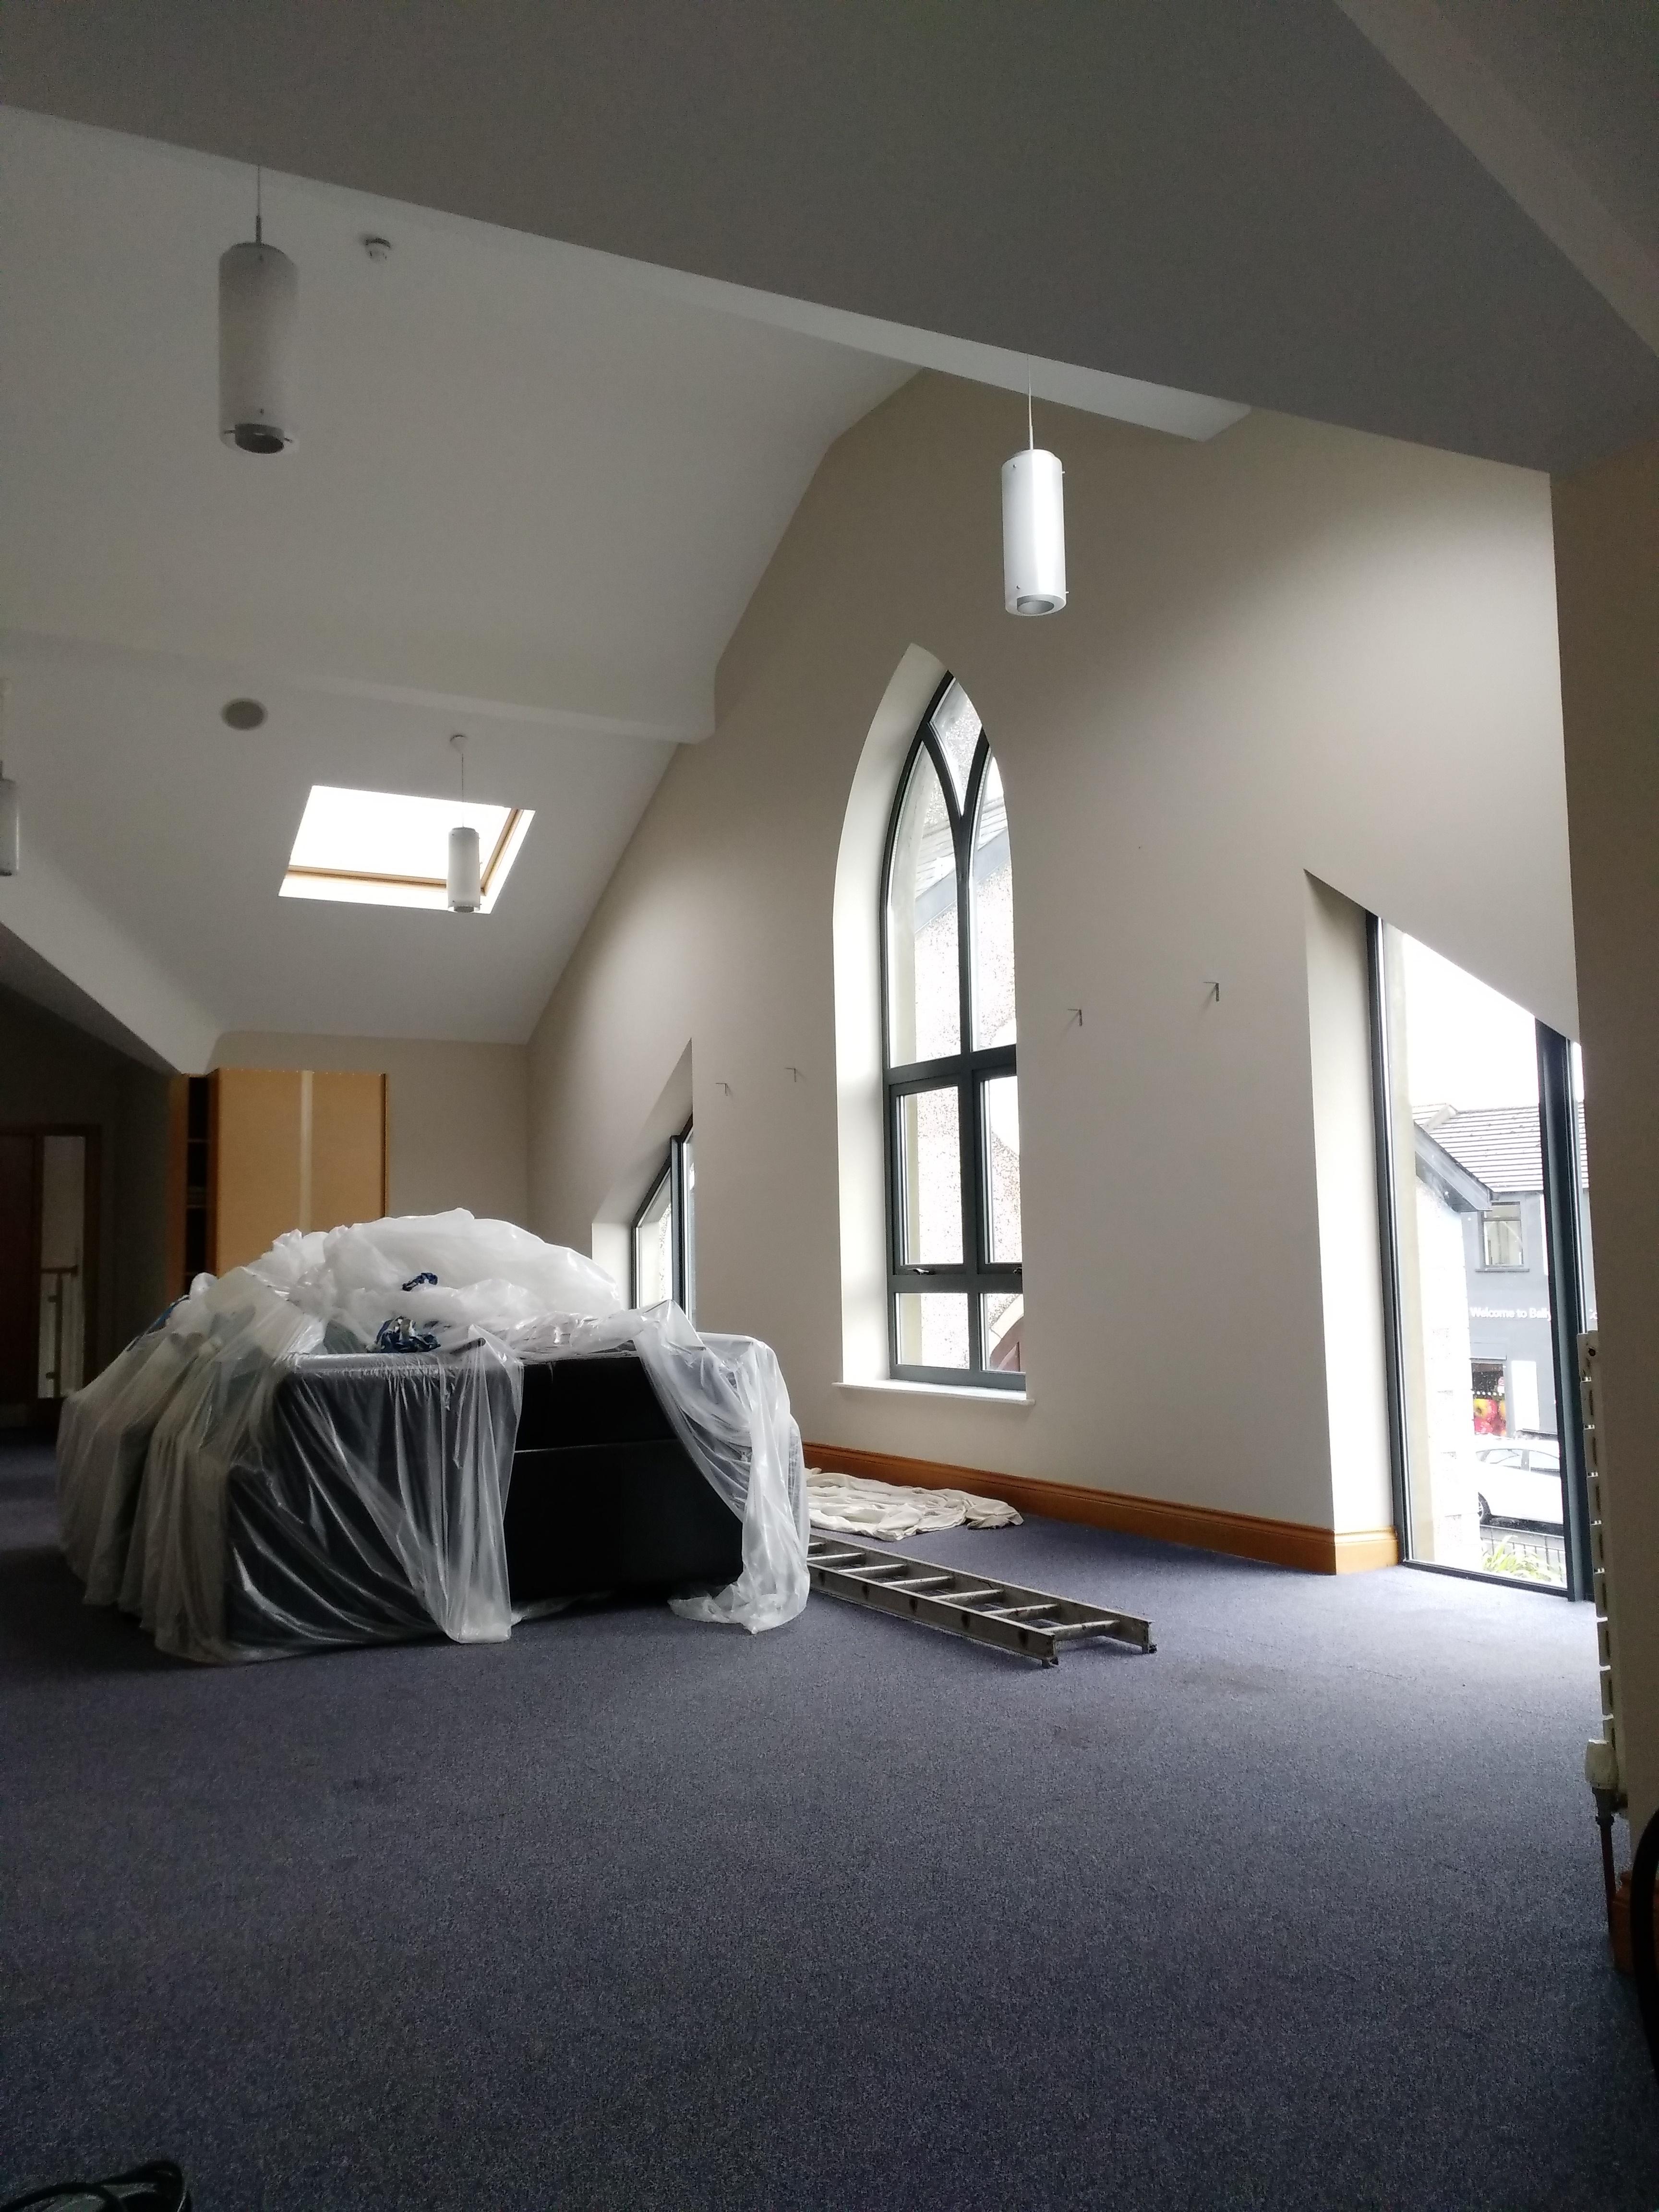 Ballynure church halls 2